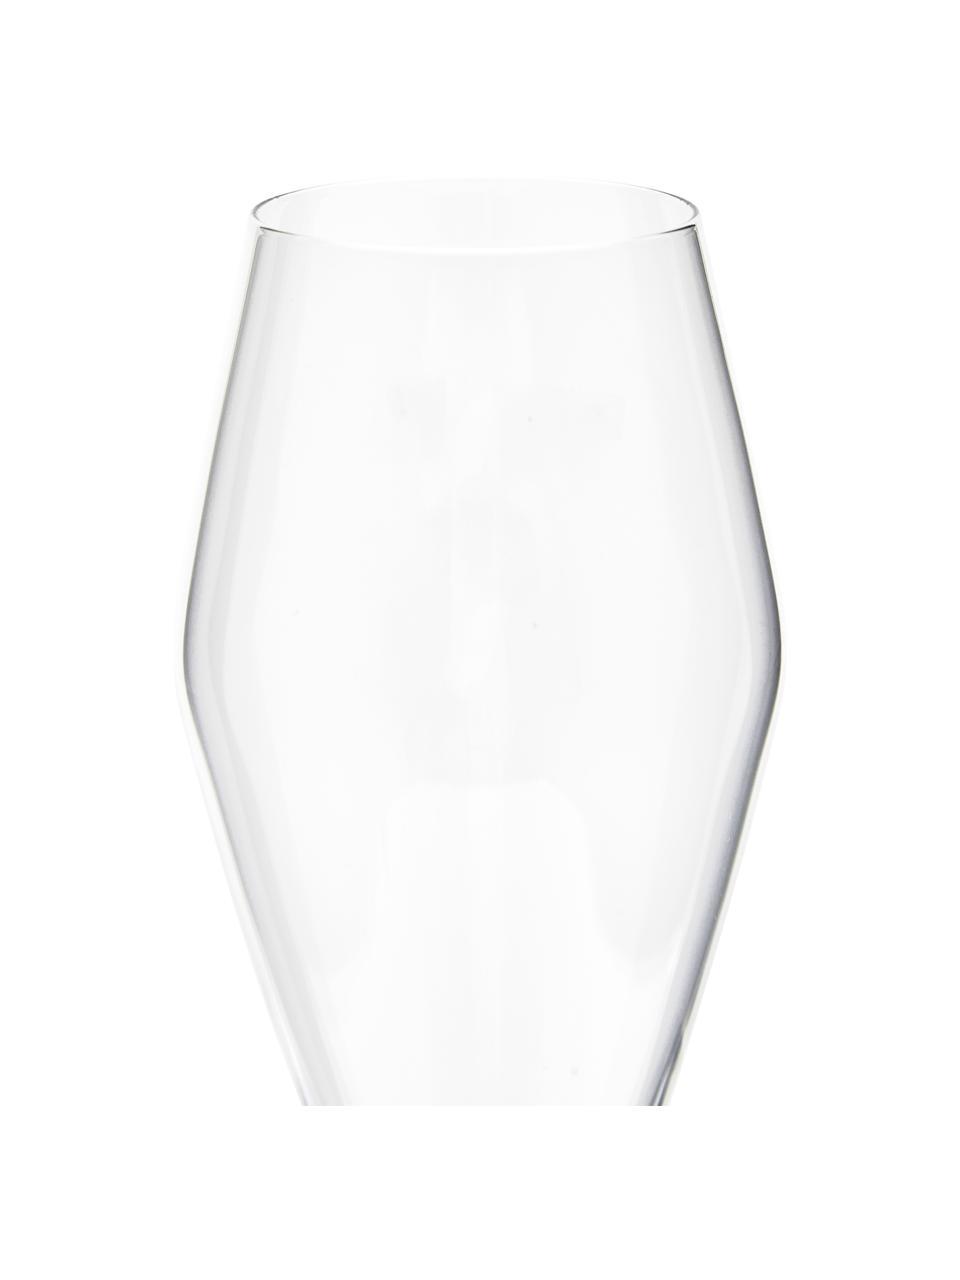 Flute champagne in vetro soffiato Ays 4 pz, Vetro, Trasparente, Ø 4 x Alt. 27 cm